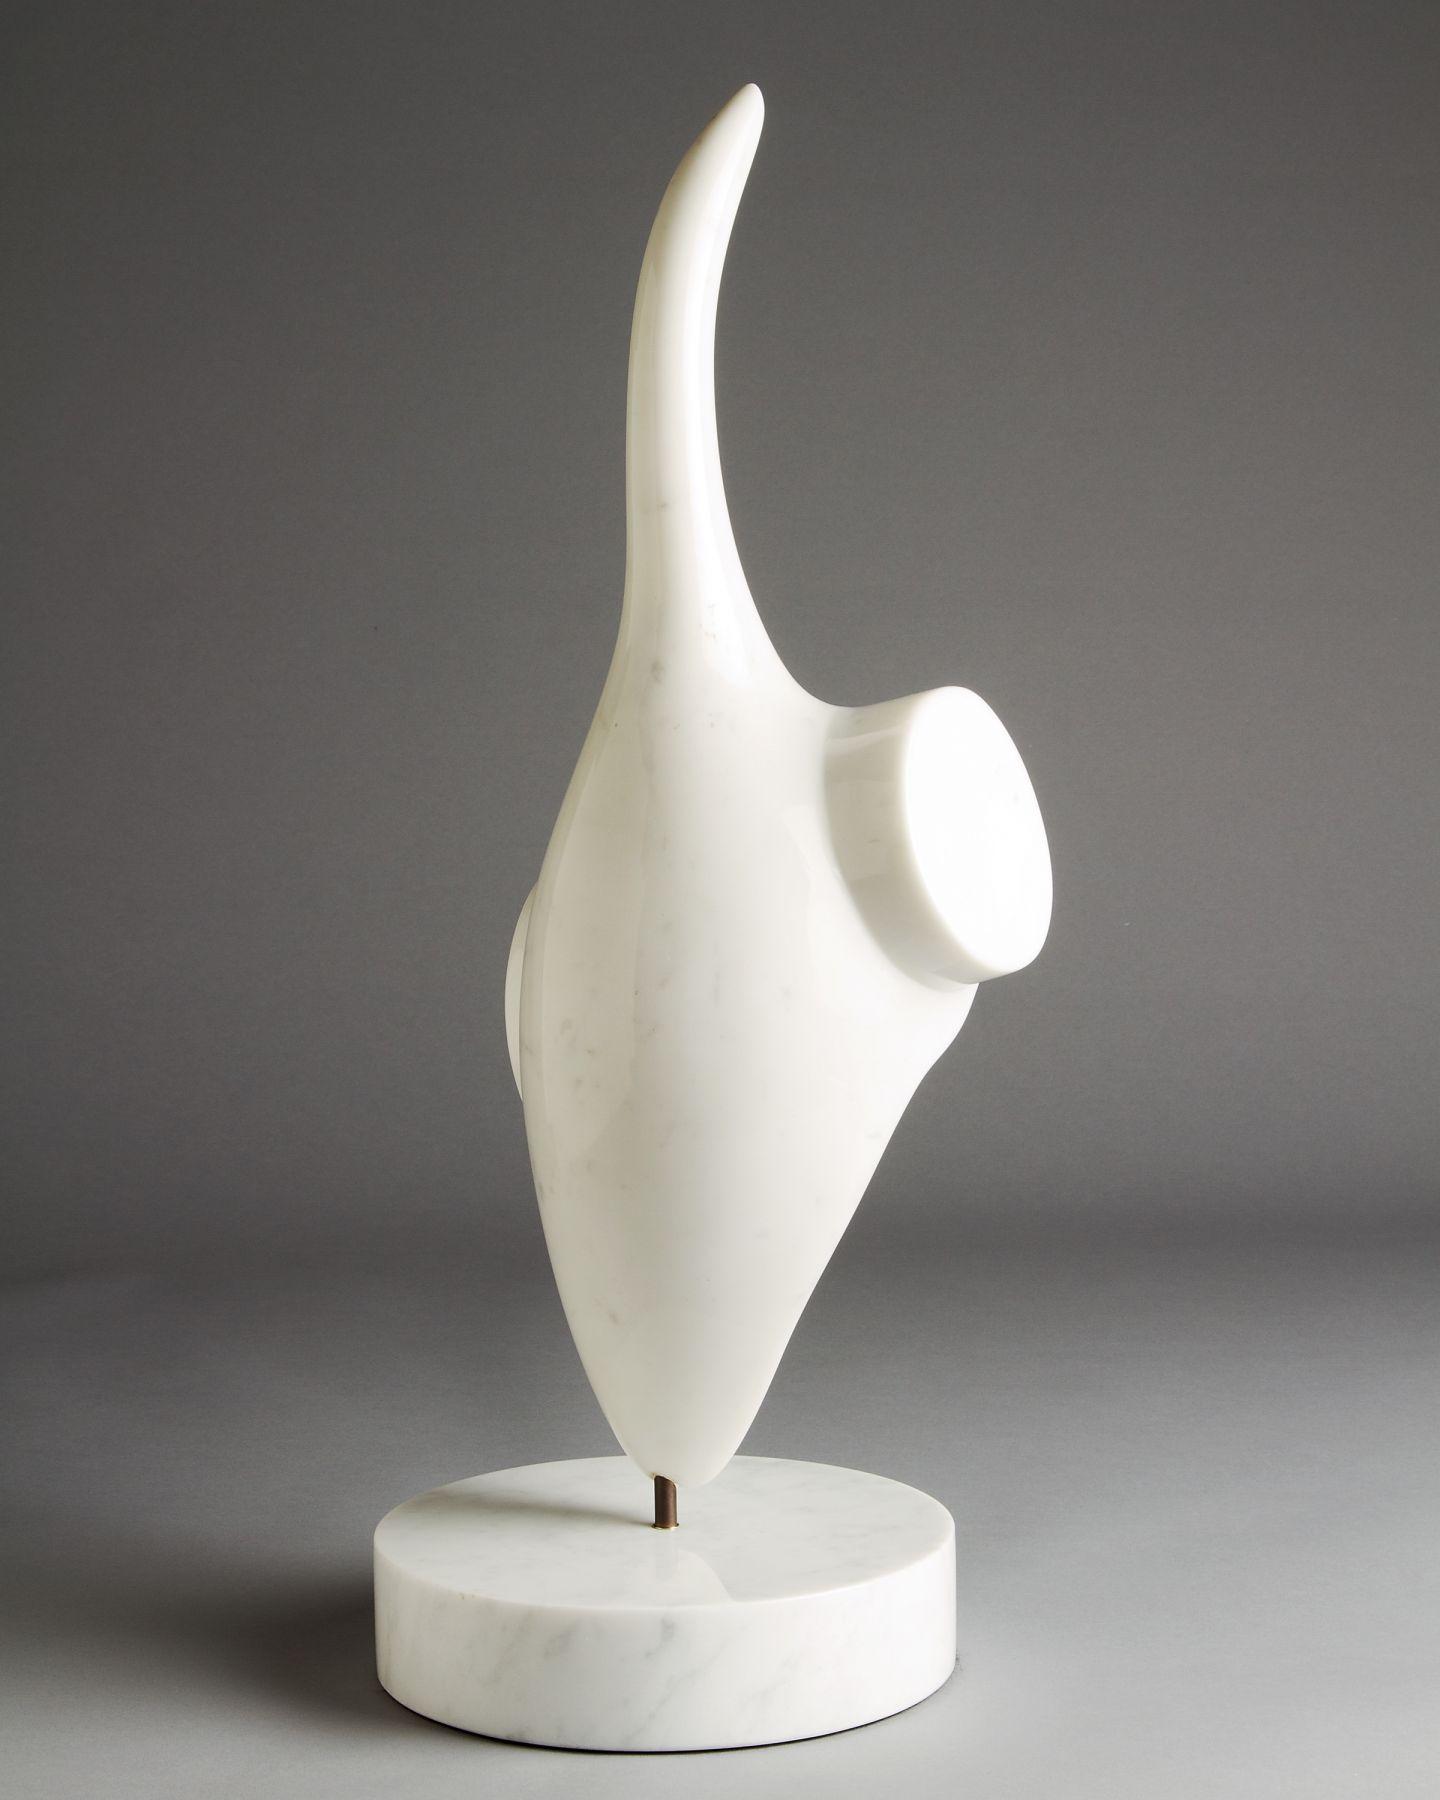 Charlie Kaplan, White Pointer, 2000, rear view